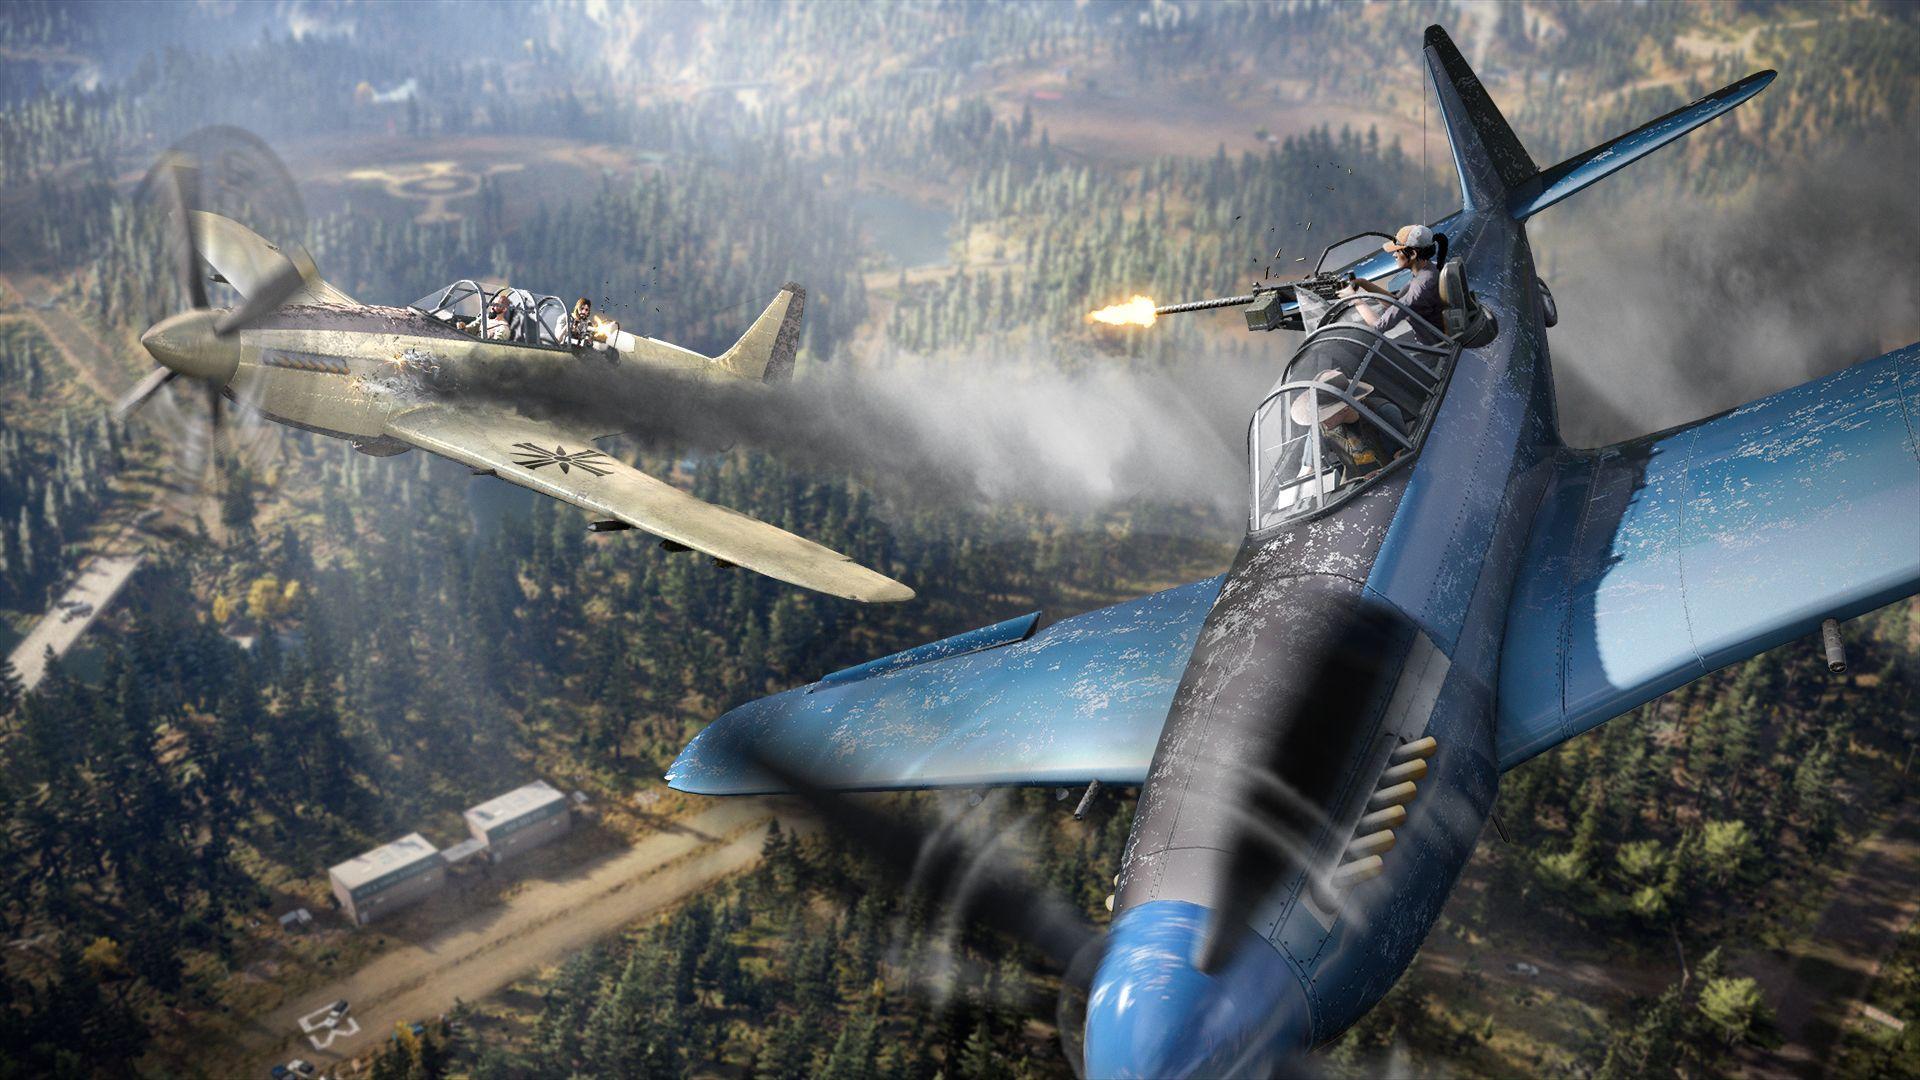 Far Cry 5 Wallpaper 4k: Far Cry 5 HD Wallpapers